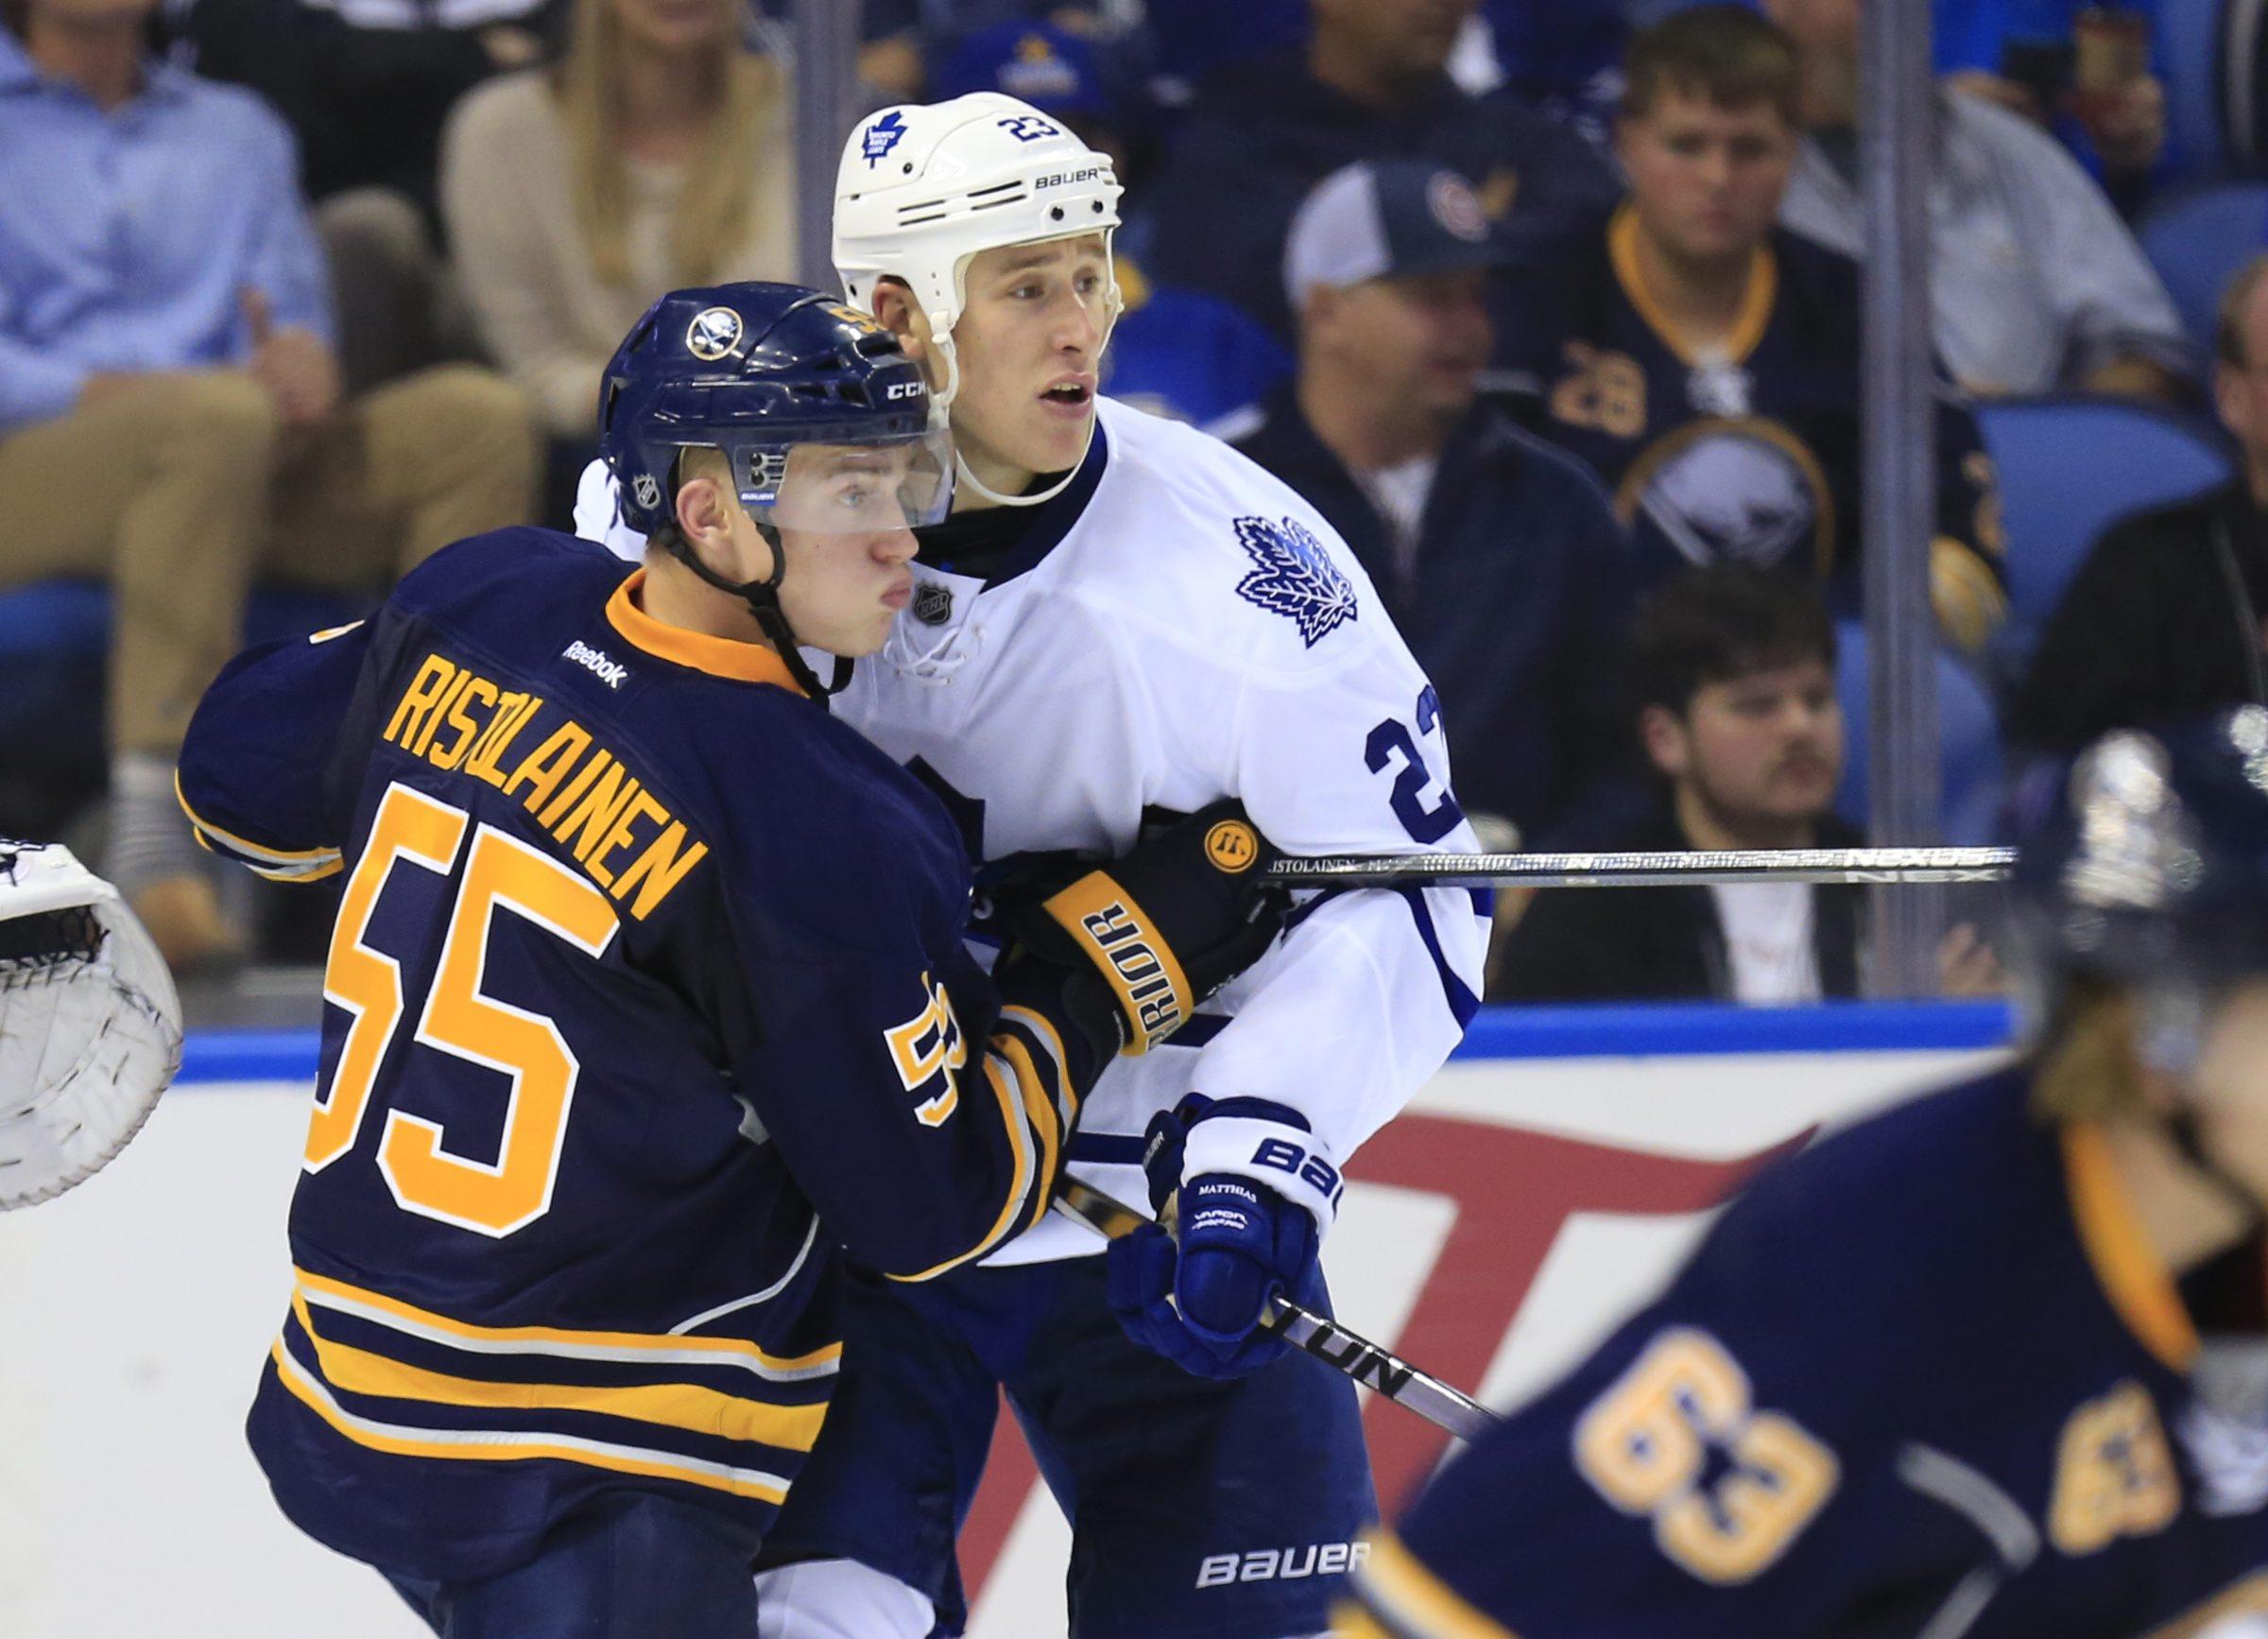 Buffalo's Rasmus Ristolainen checks Toronto's Shawn Matthias last season during one of the previous 99 editions of the rivalry.  (Harry Scull Jr./Buffalo News)